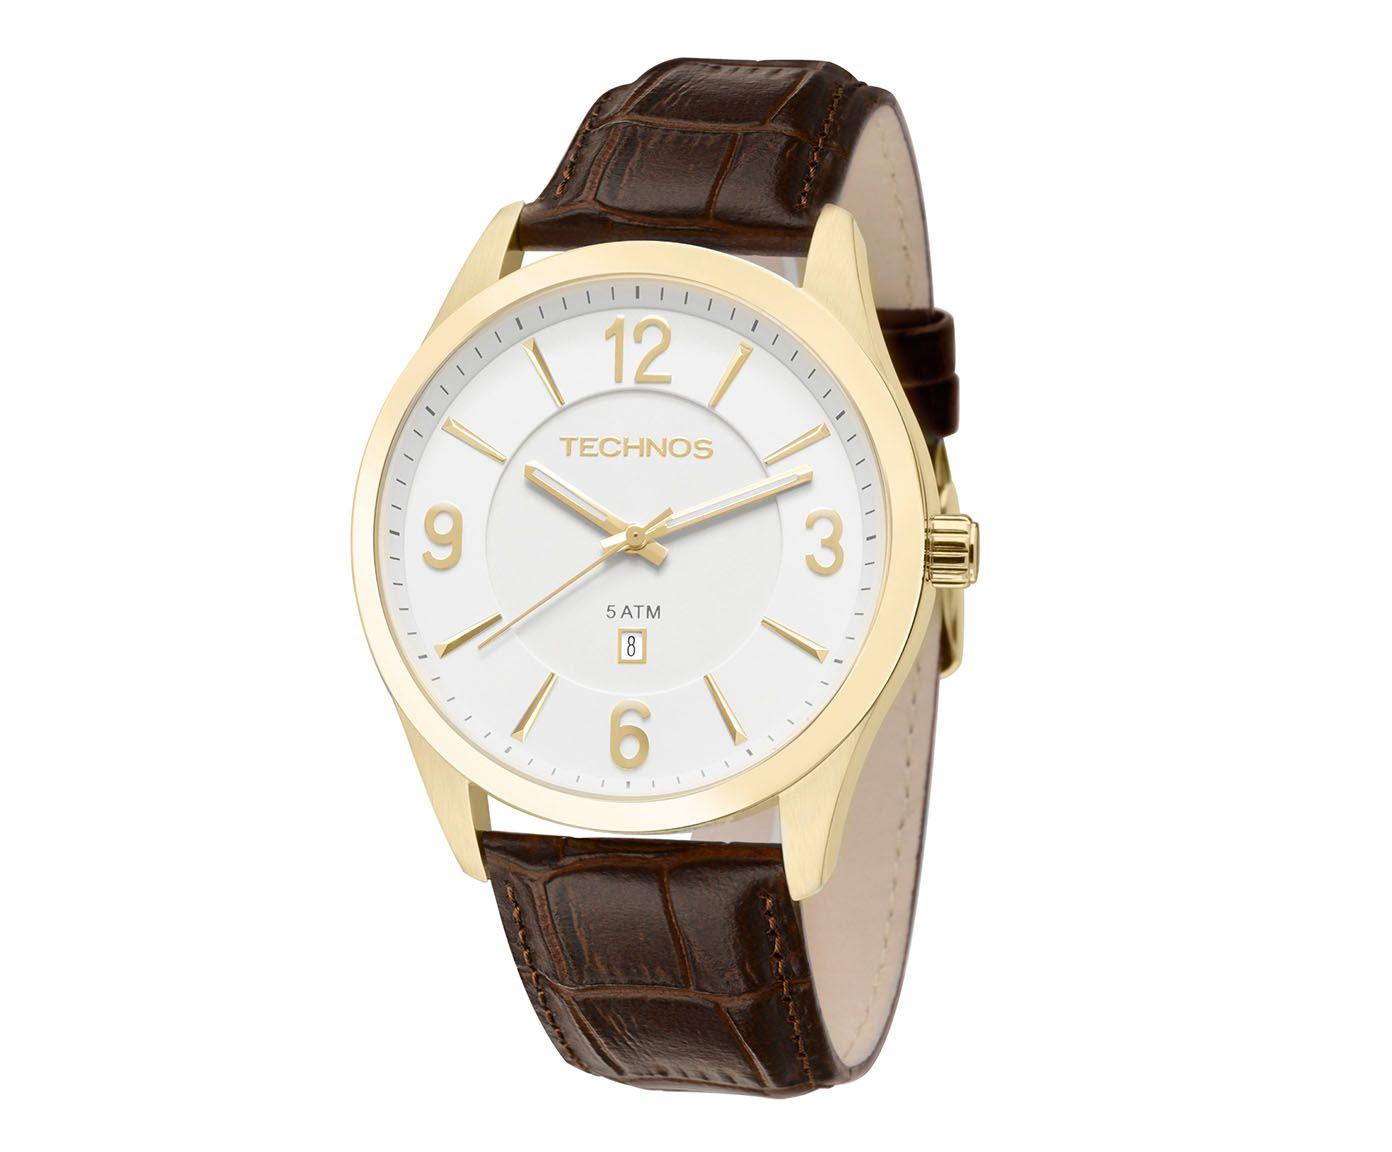 Relógio Technos Marrom | Westwing.com.br